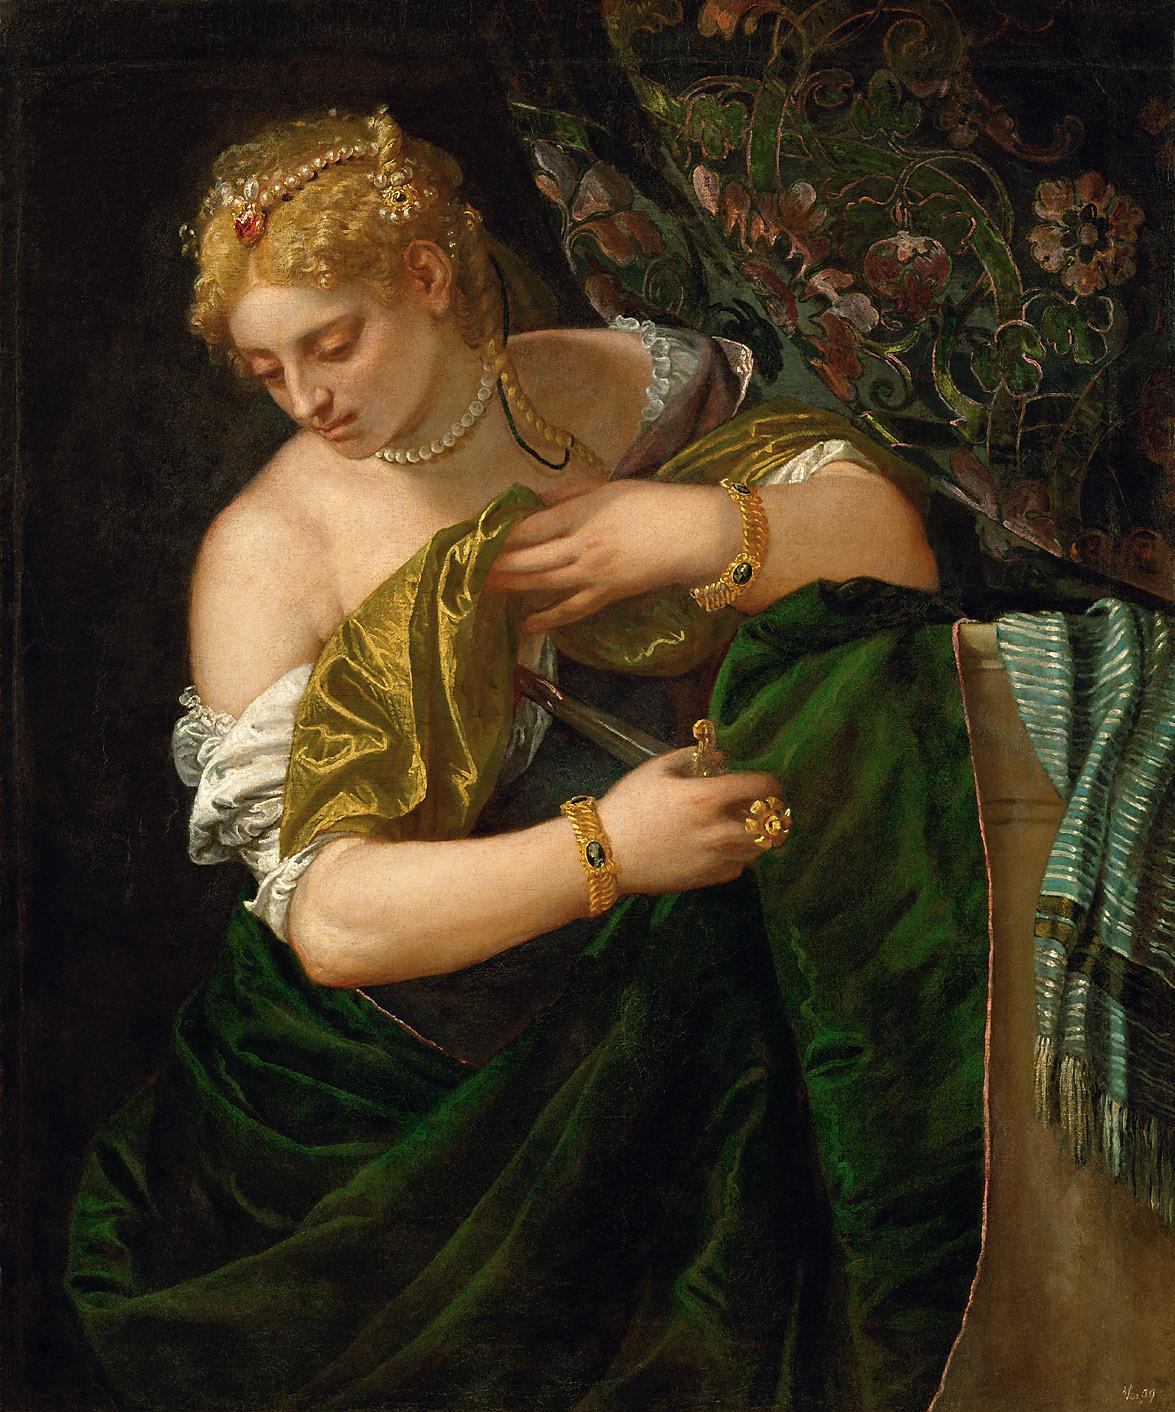 Paolo Veronese (1528 Verona - 1588 Venedig). Lukrezia. um 1580/1583. Kunsthistorisches Museum Wien / Паоло Веронезе (1528 Верона - 1588 Венеция) - Лукреция. 1580/1583.  Музей истории искусств, Вена.